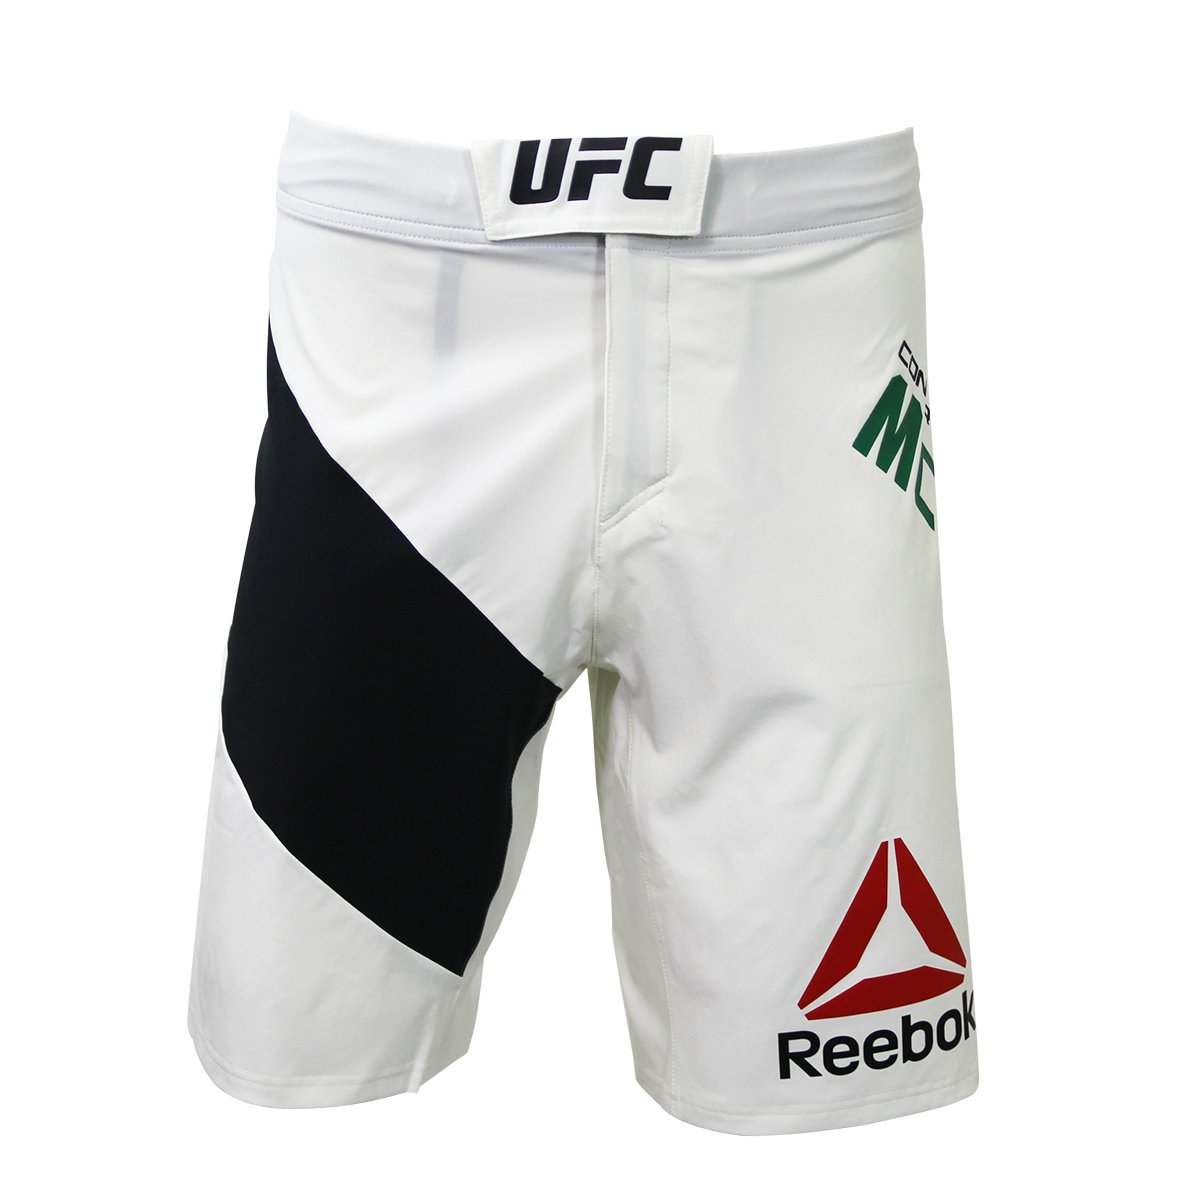 Reebok kit UFC Champion ottagonale Short Men Fighting Short Speedwick, White, XL